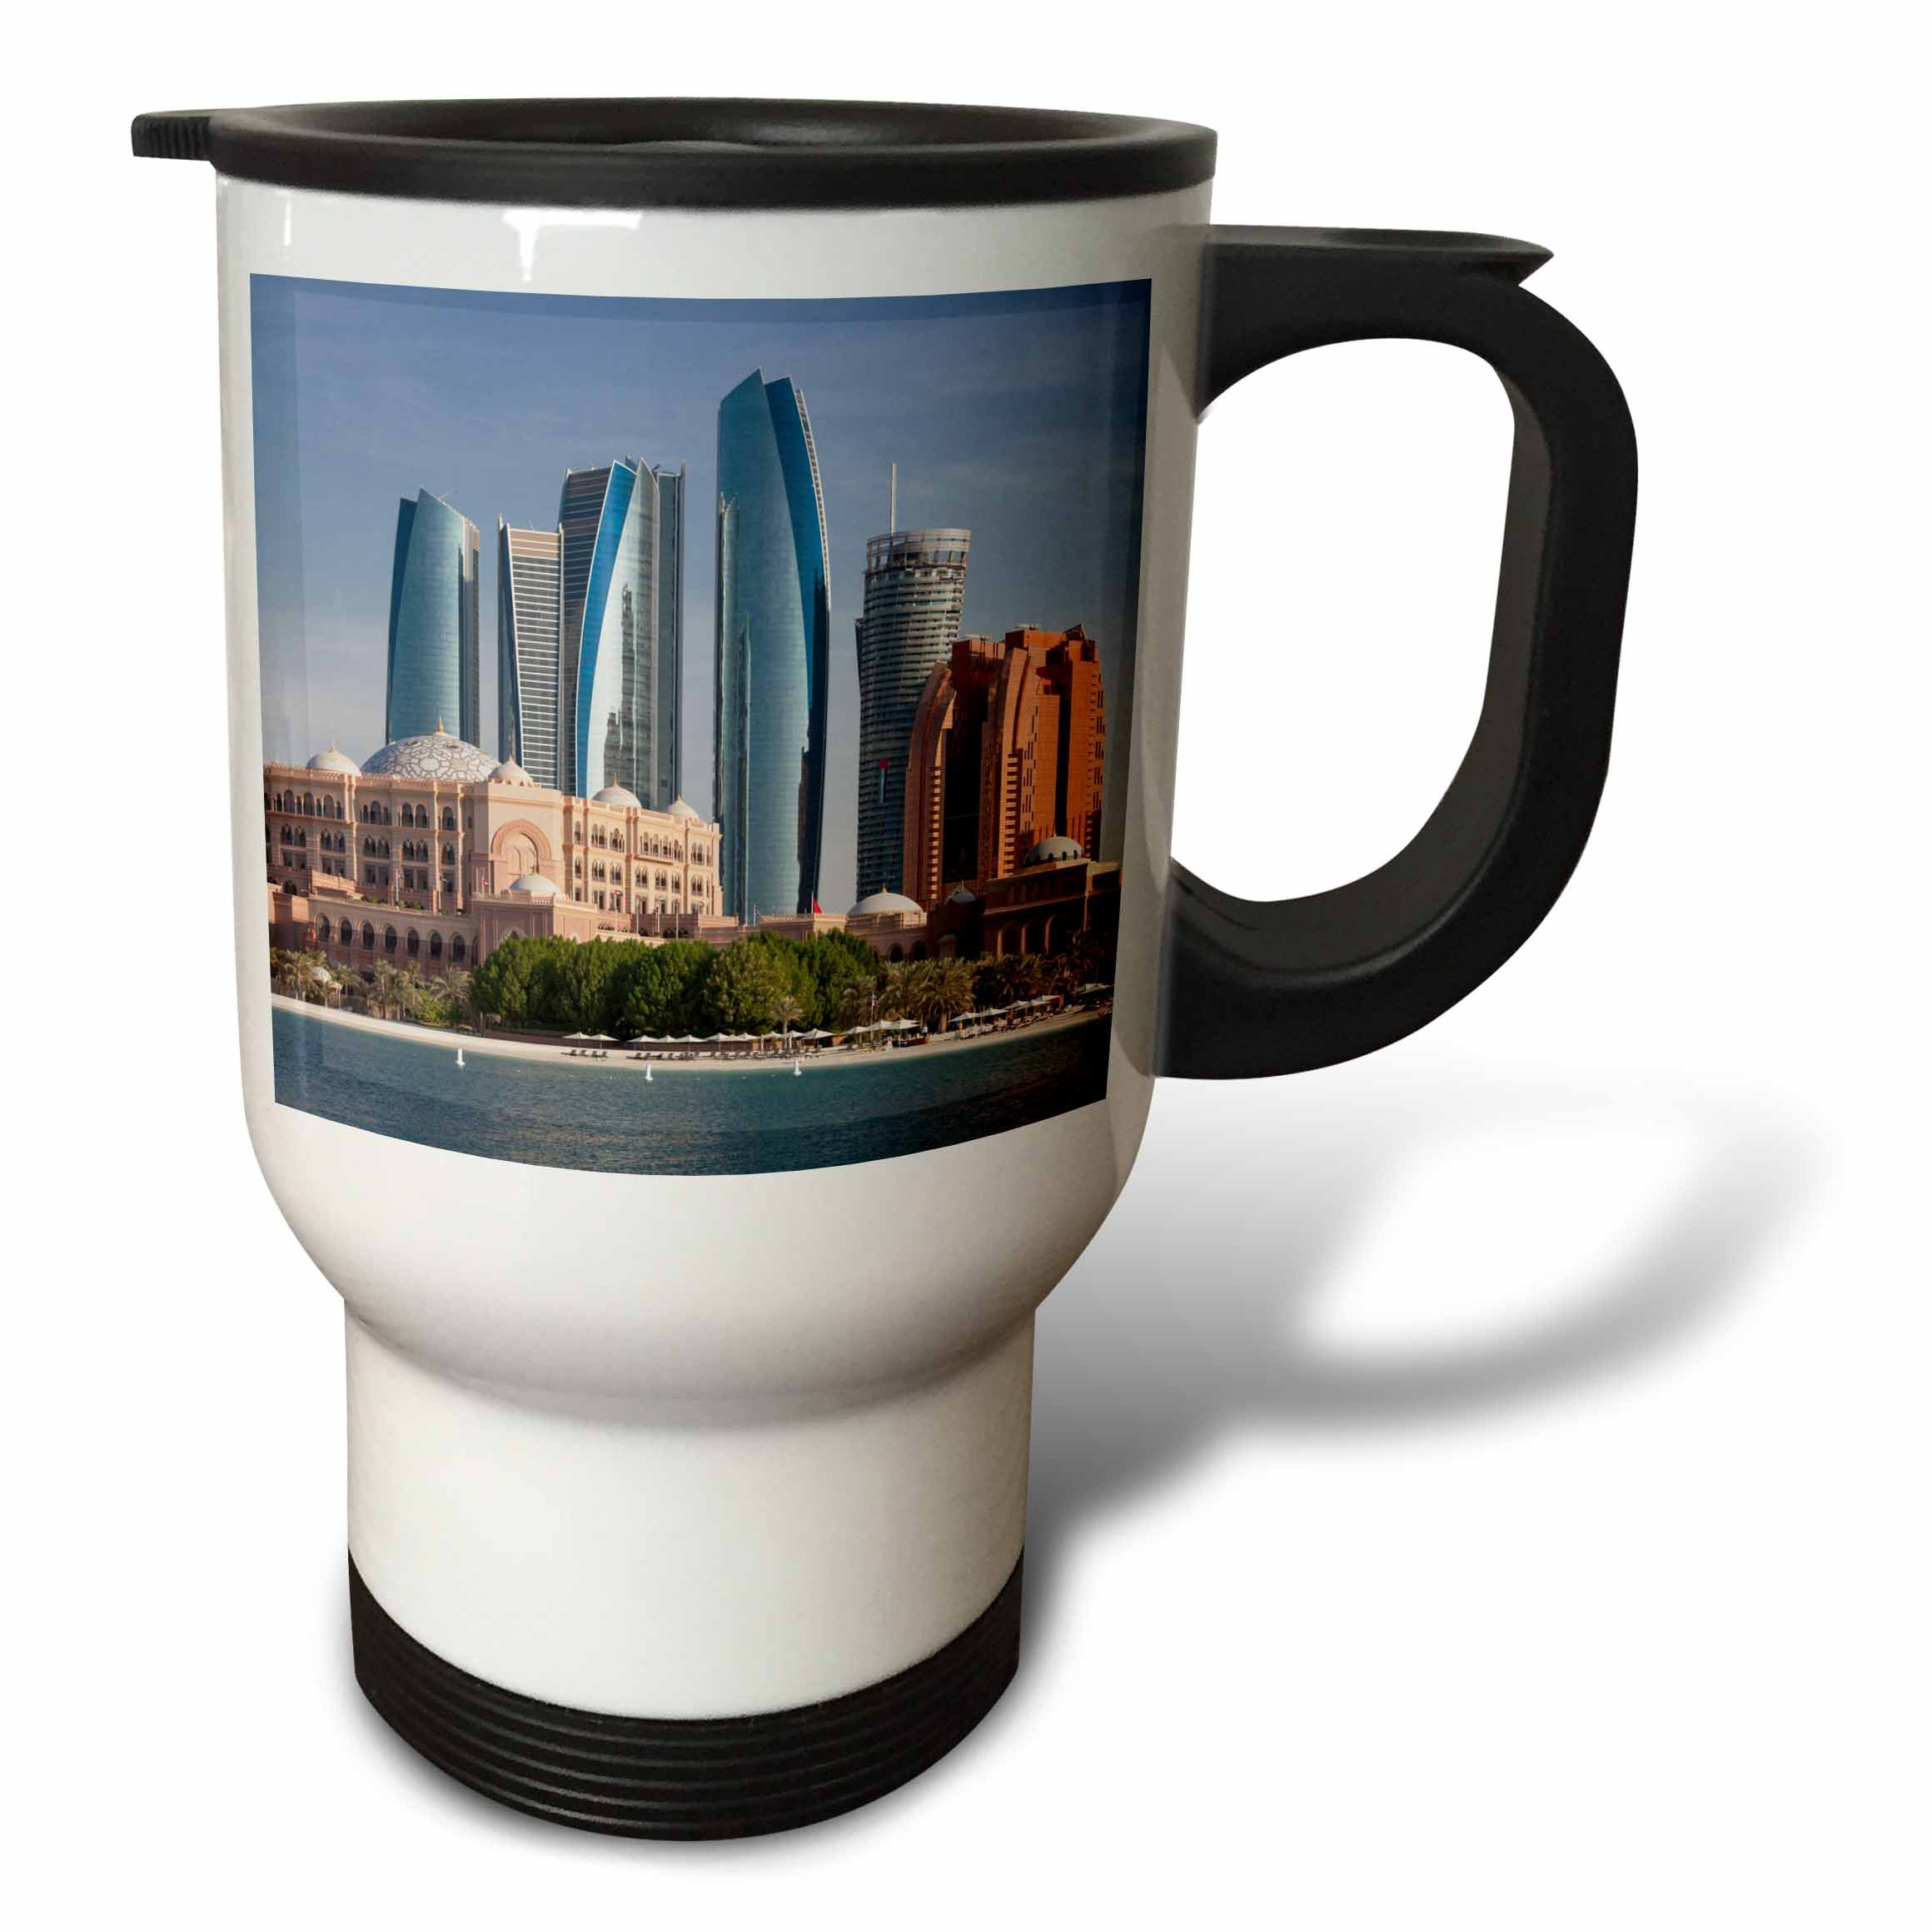 3dRose Danita Delimont - Cities - UAE, Abu Dhabi. Etihad Towers and Emirates Palace Hotel - 14oz Stainless Steel Travel Mug (tm_277131_1)